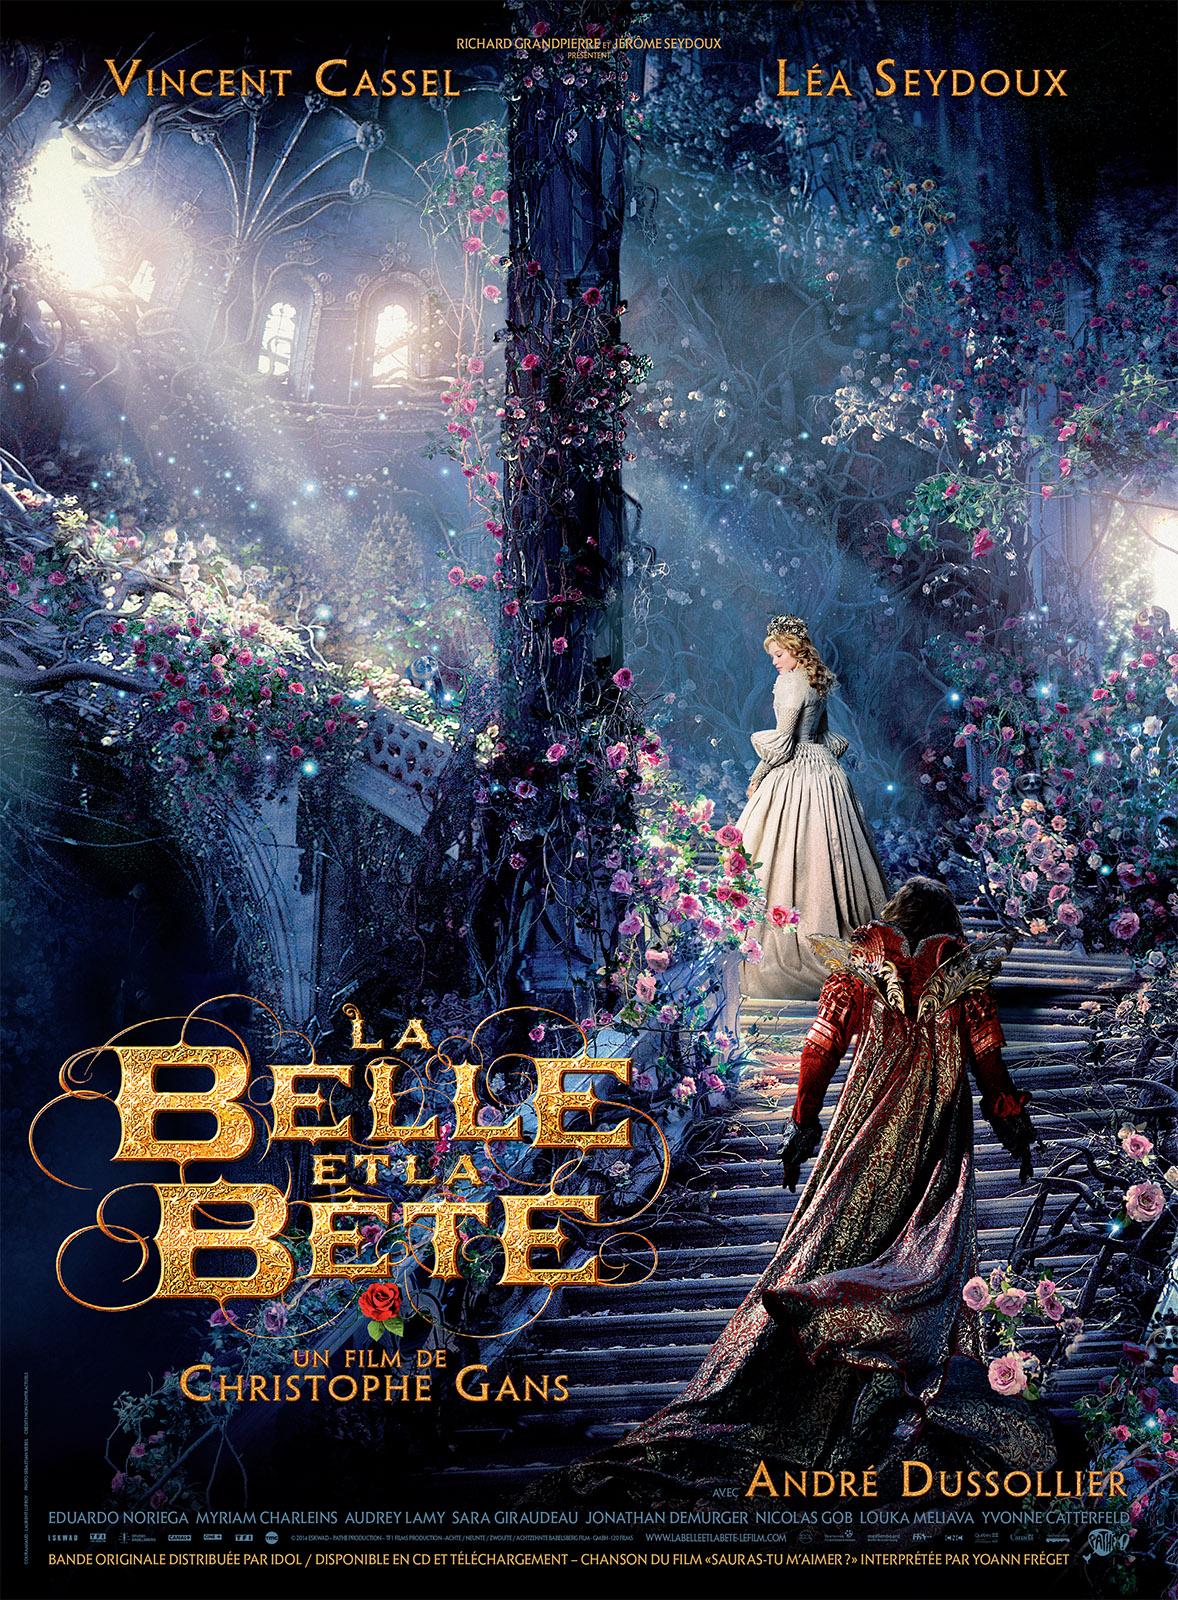 Affiche_La_Belle_et_la_Bete_Lea-Seydoux-2.jpg